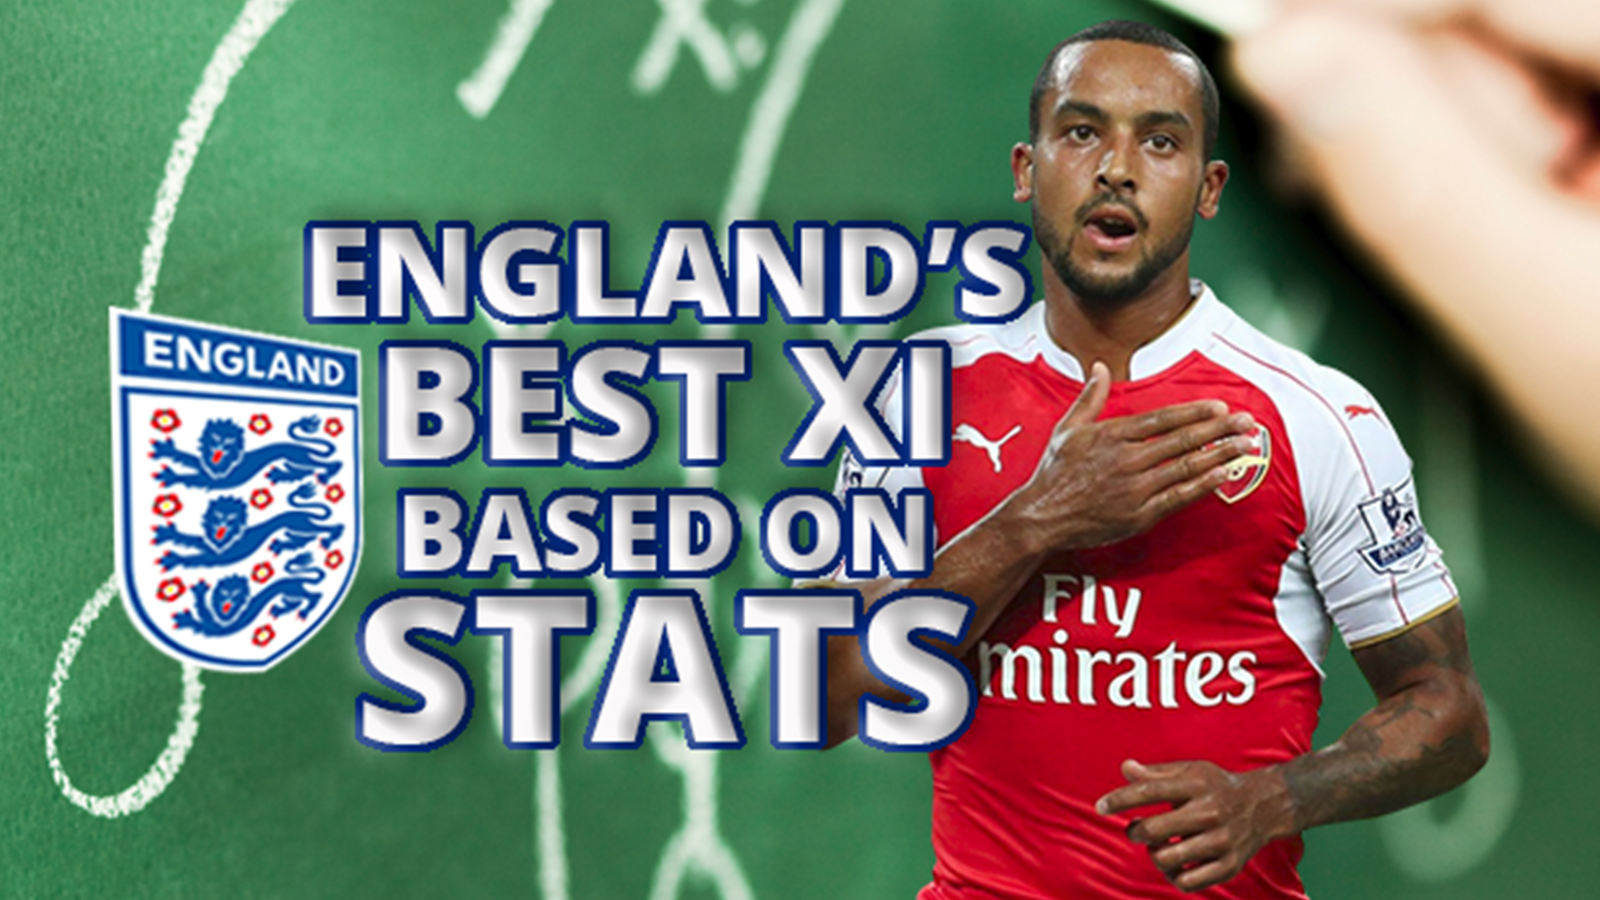 video - england u0026 39 s best xi - based on opta stats